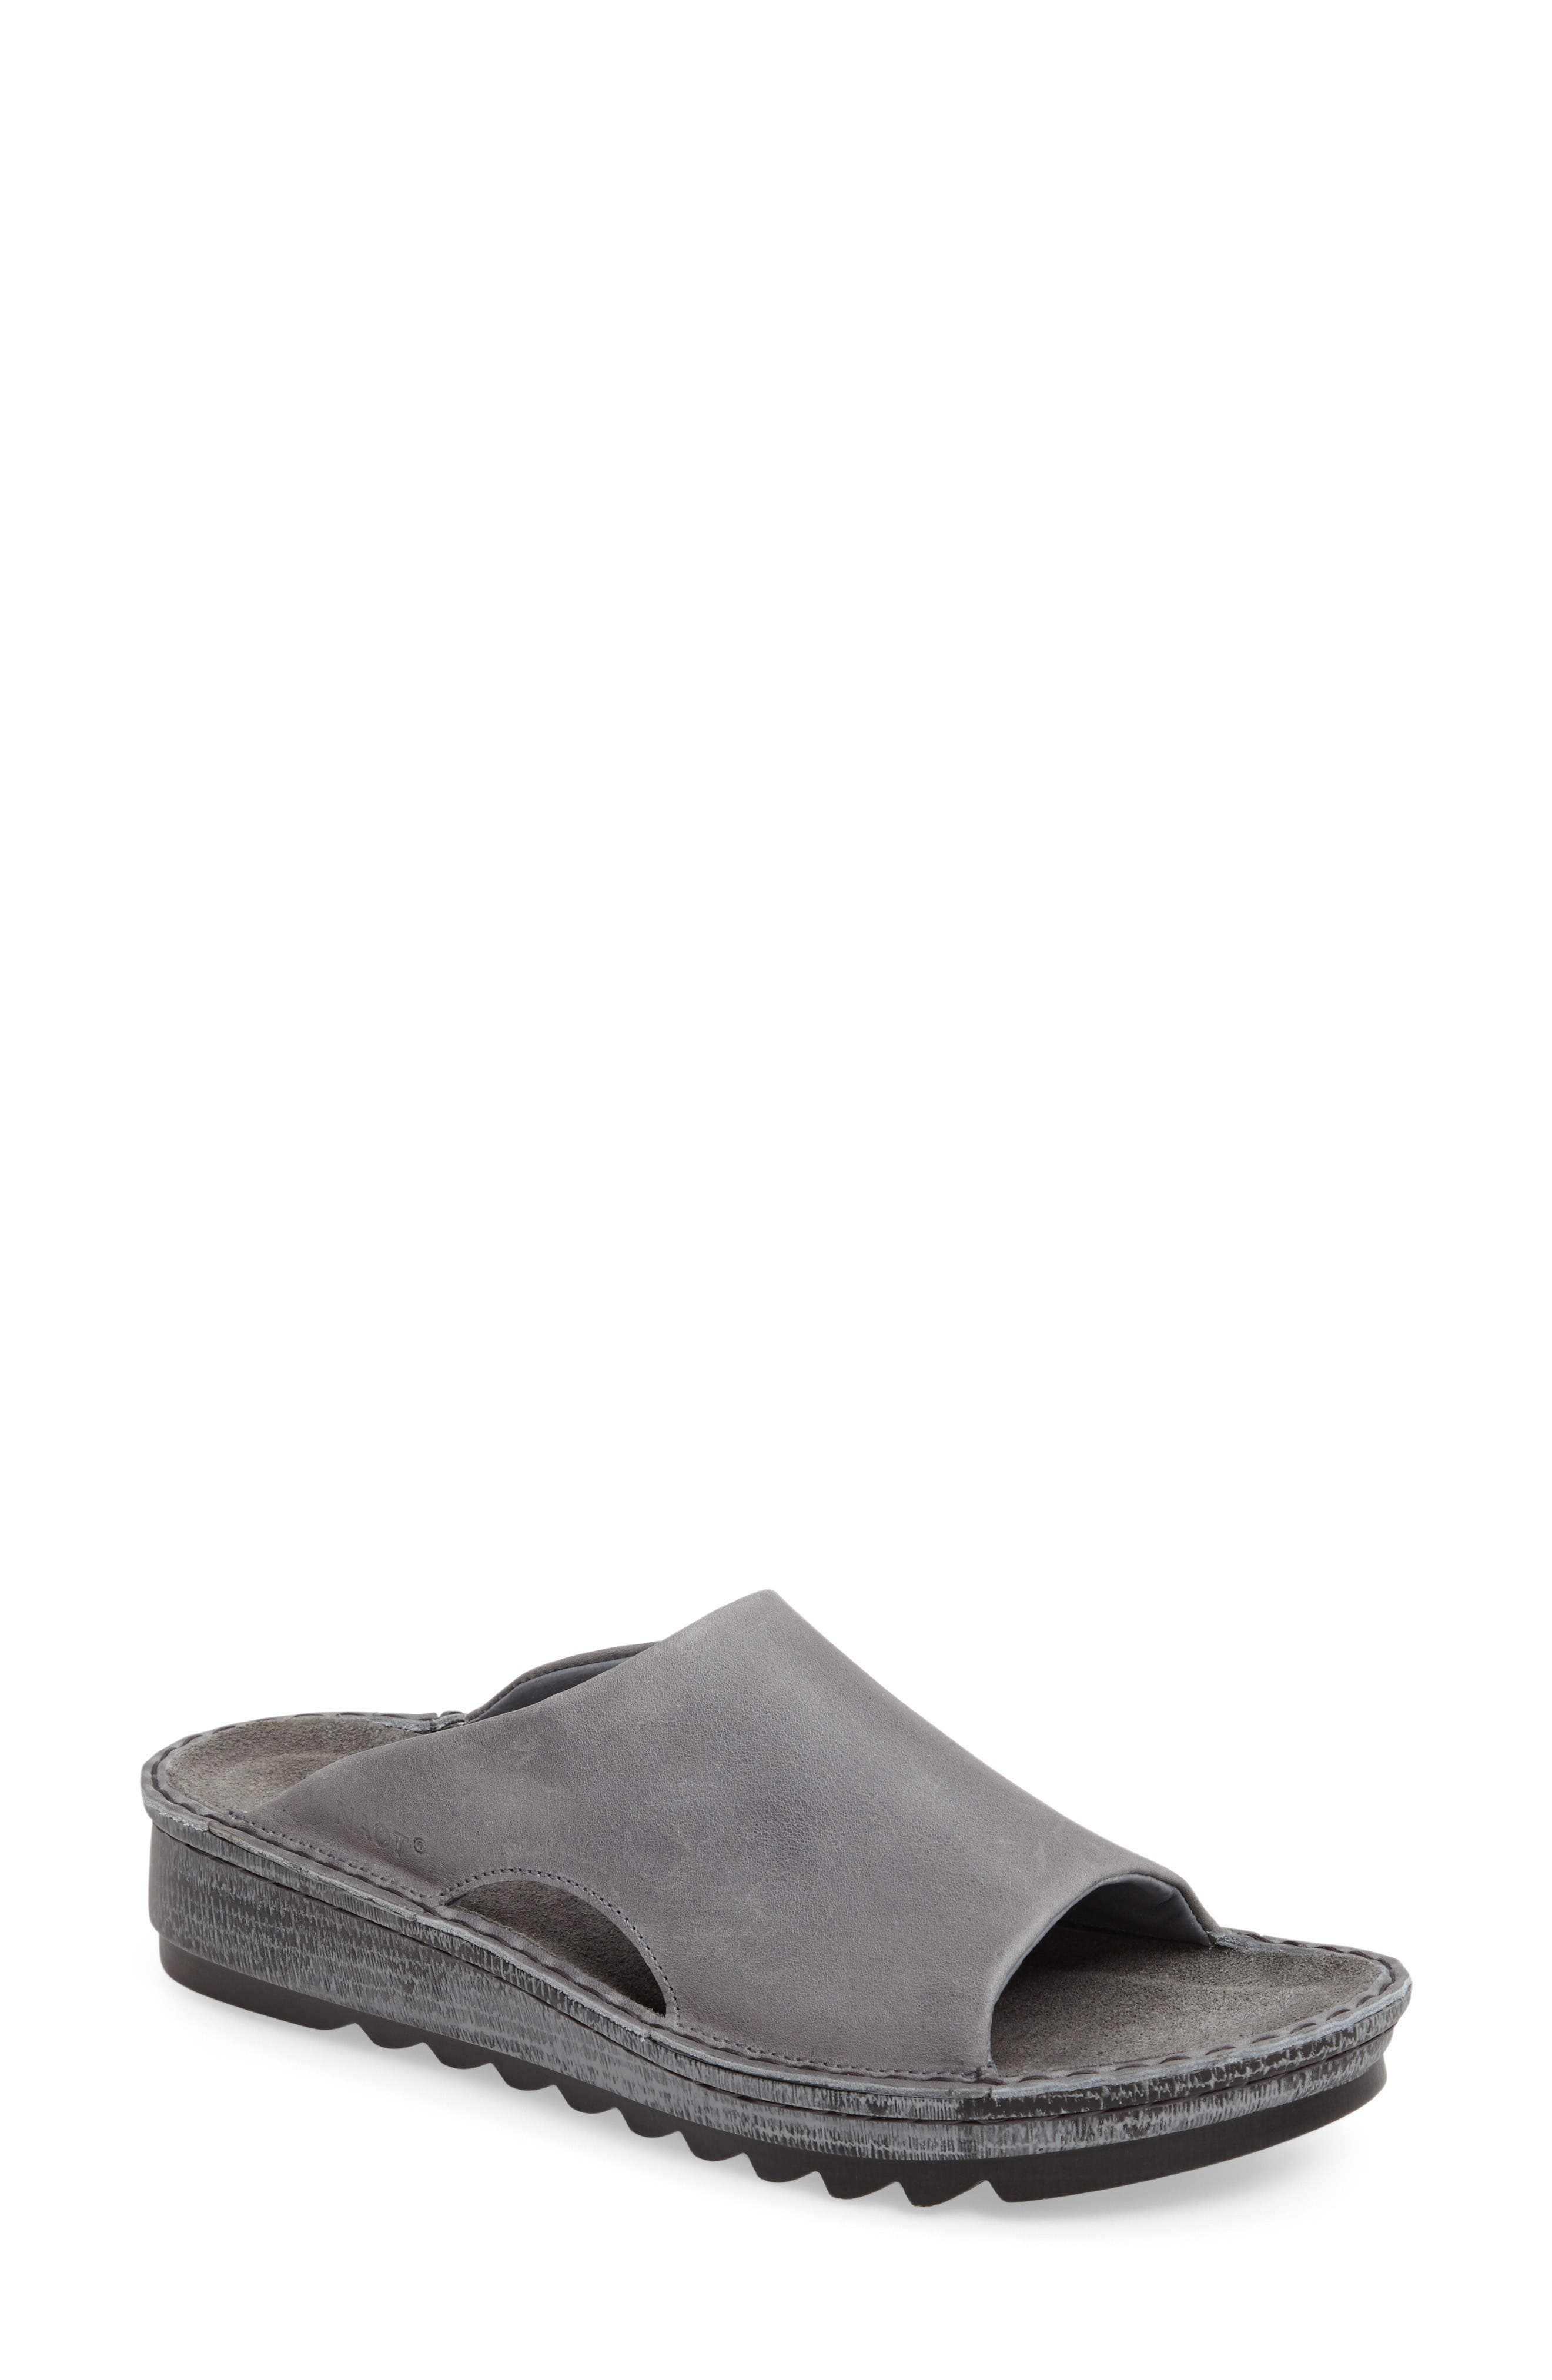 Main Image - Naot 'Ardisia' Slide Sandal (Women)